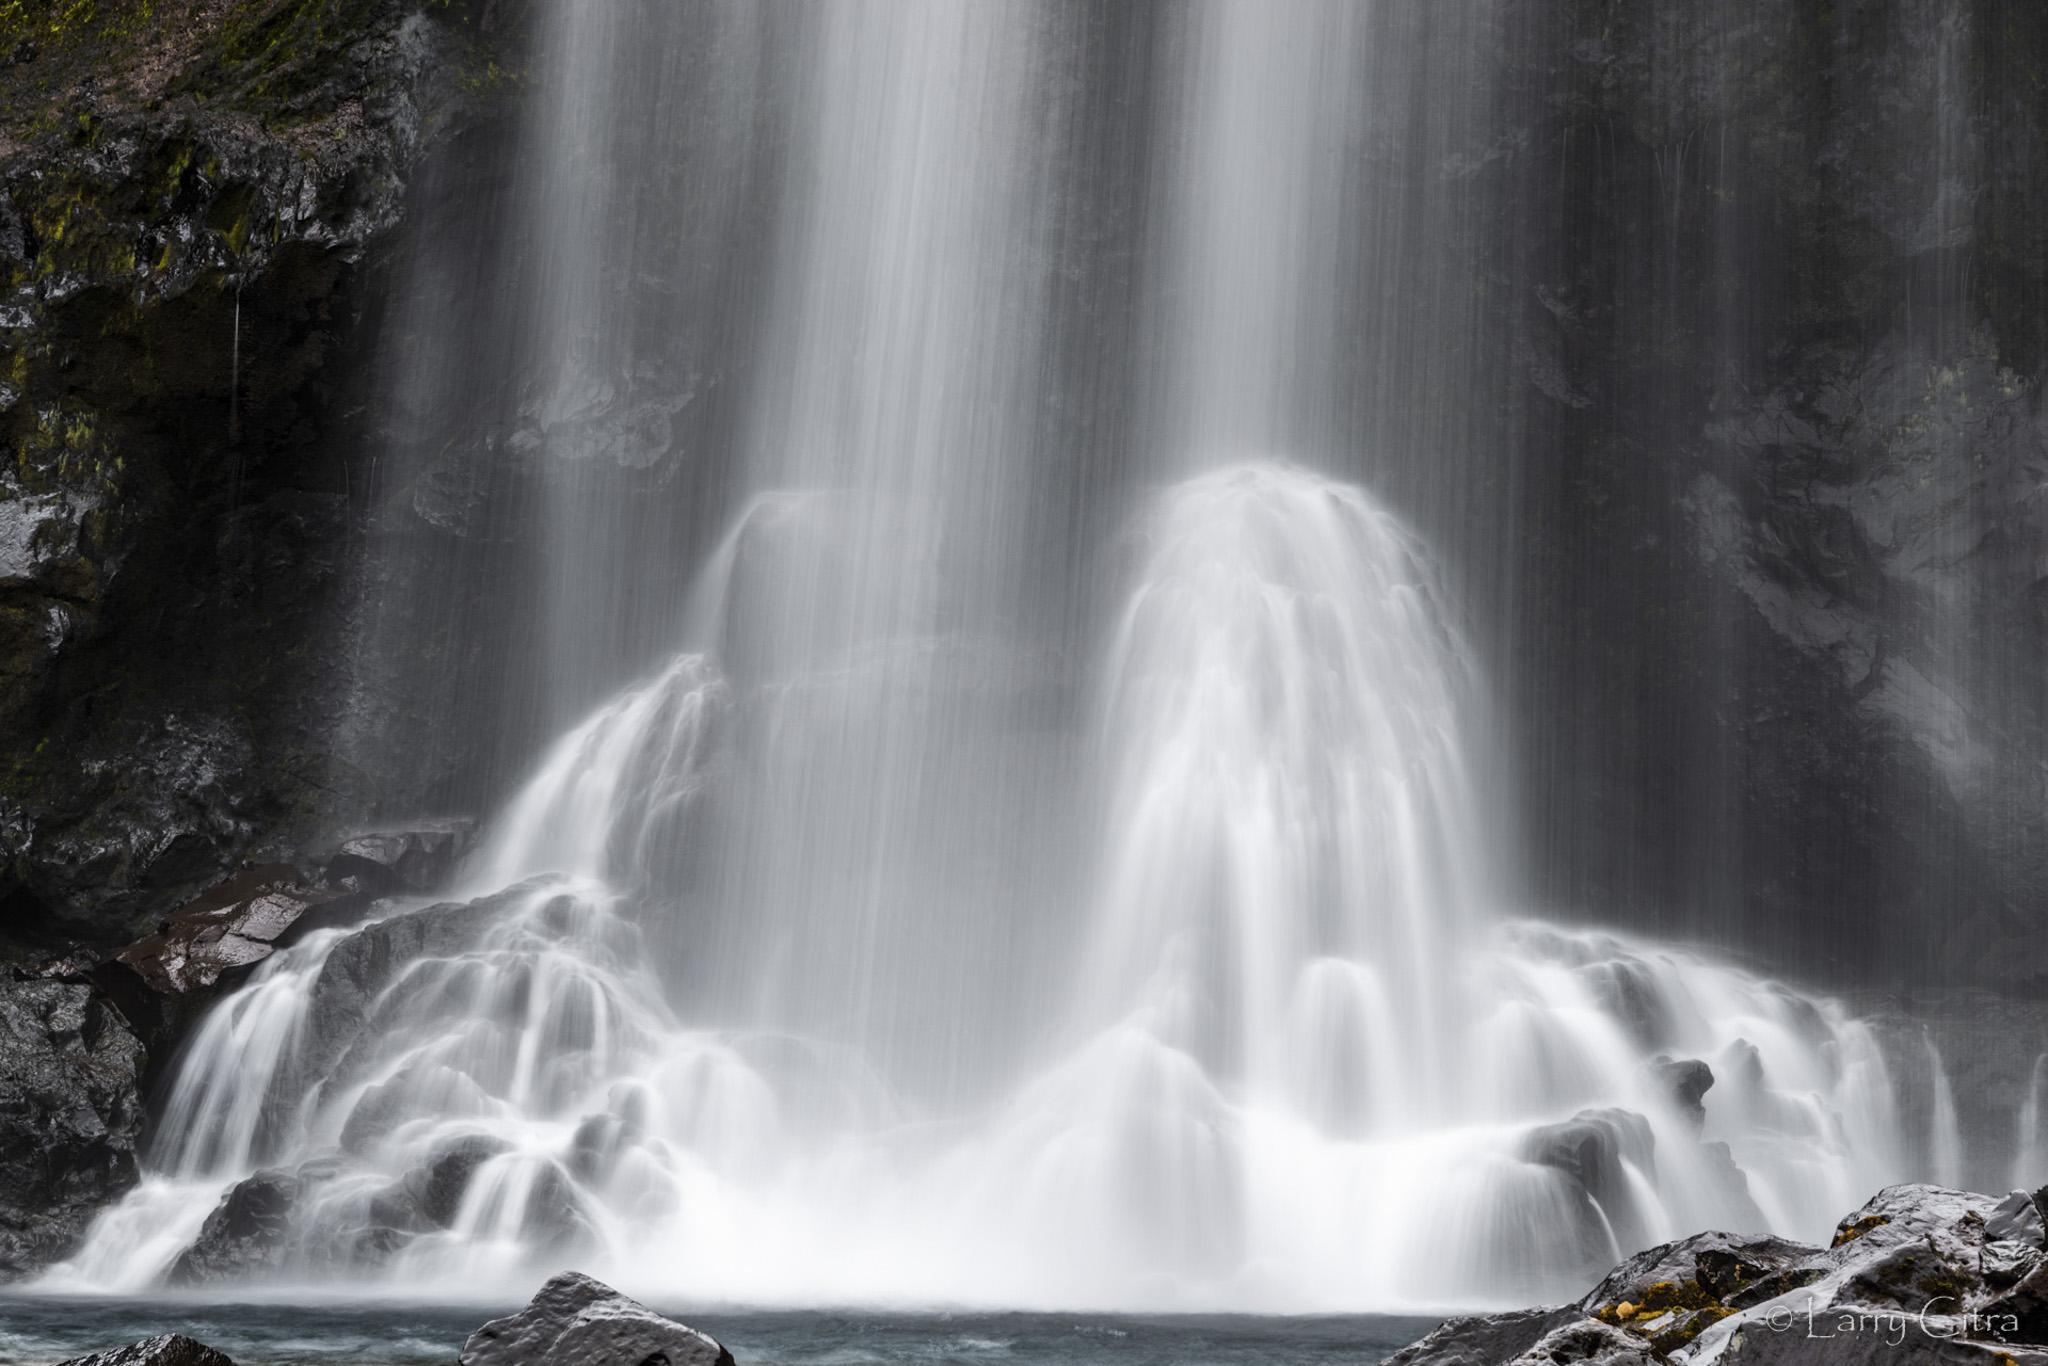 Gufufoss near Seydisfjordur, Iceland © Larry Citra